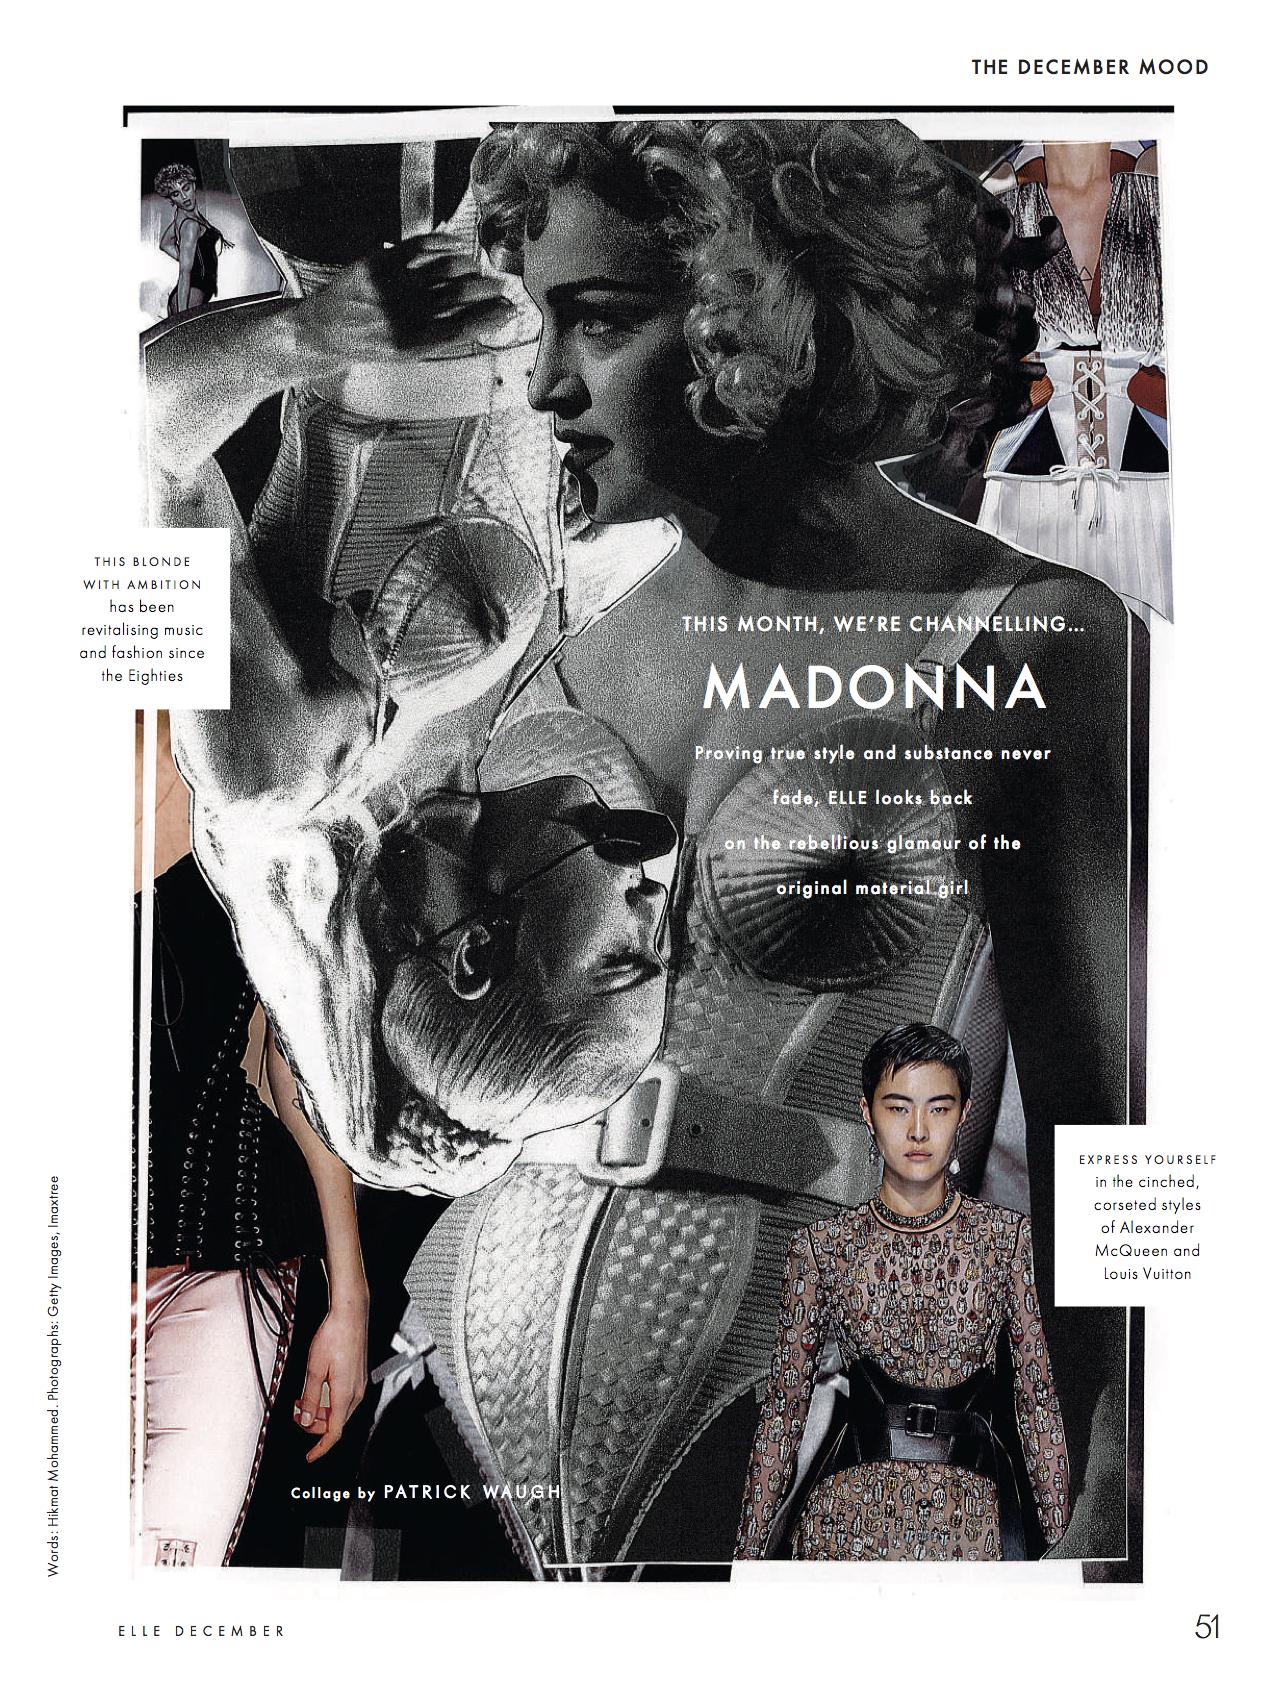 December mood - Madonna_pdf_zinio_1.jpeg